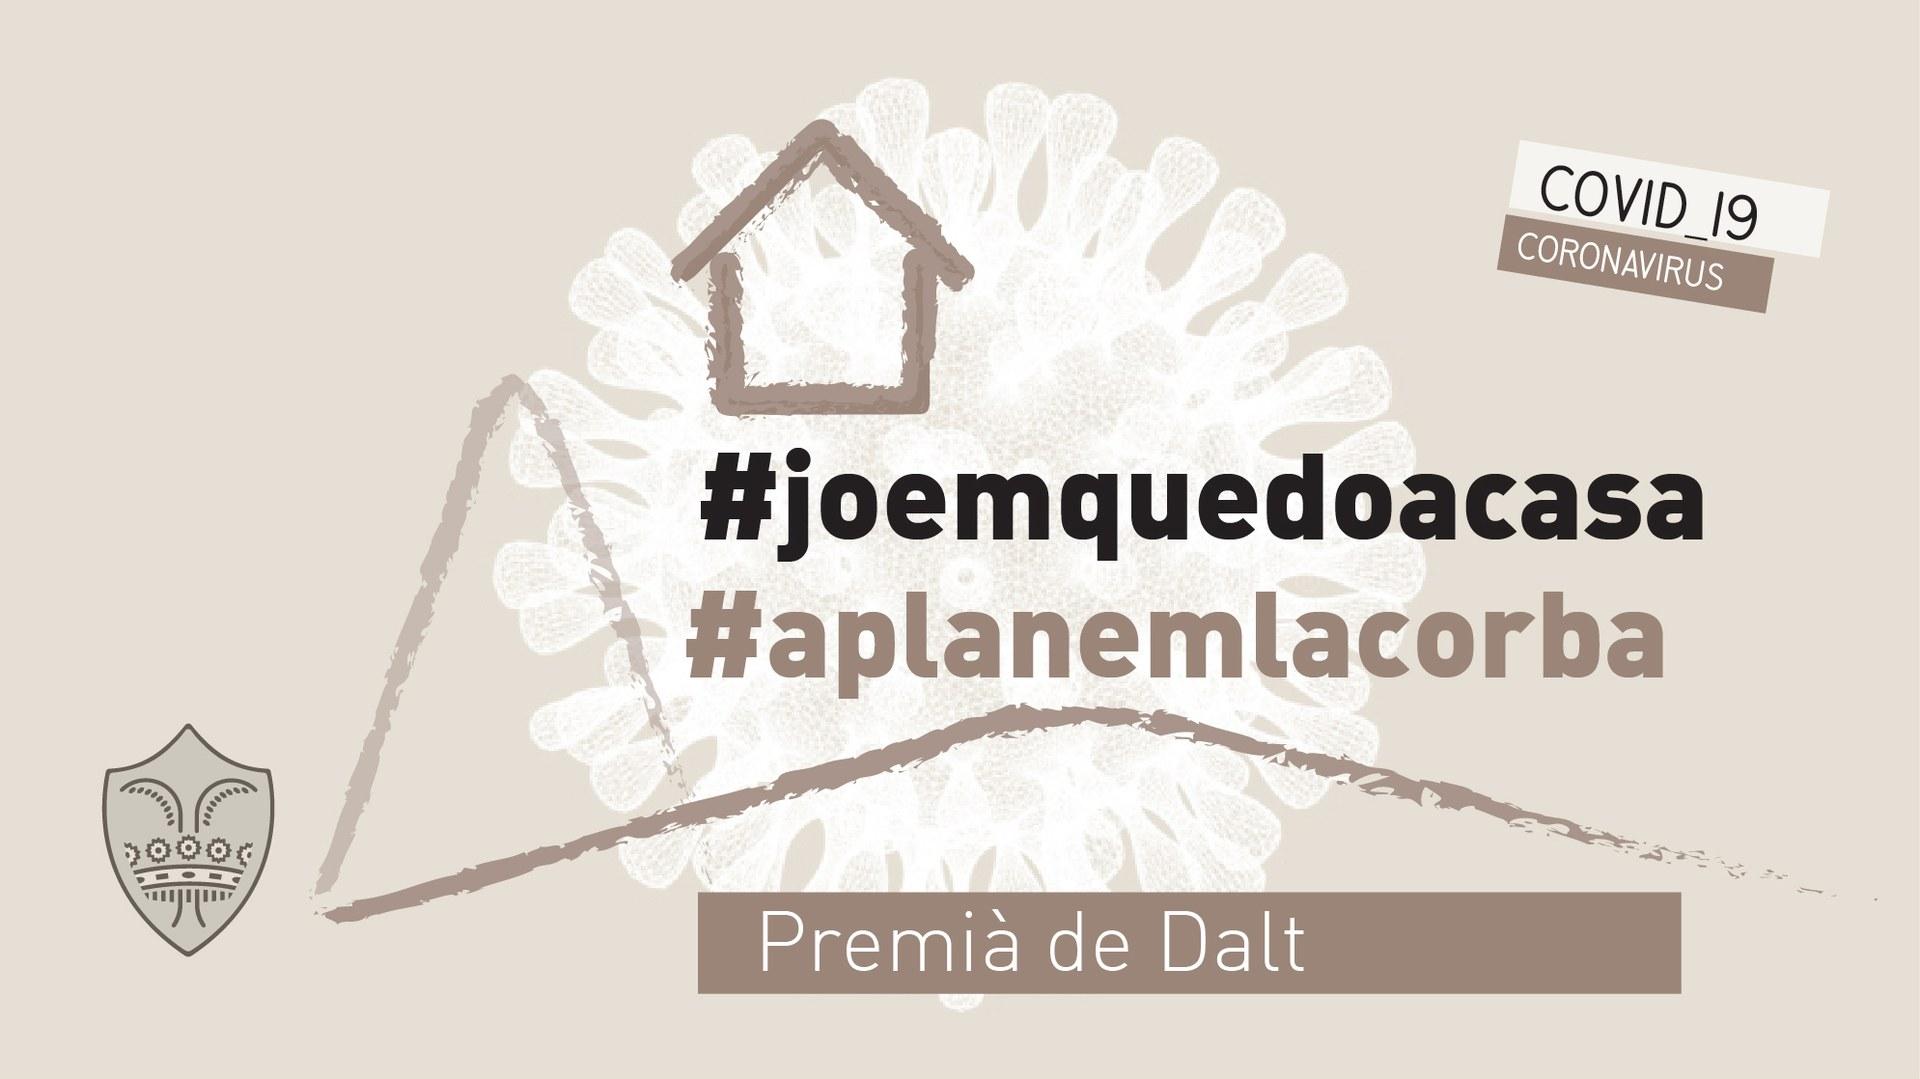 Joemquedoacasa2